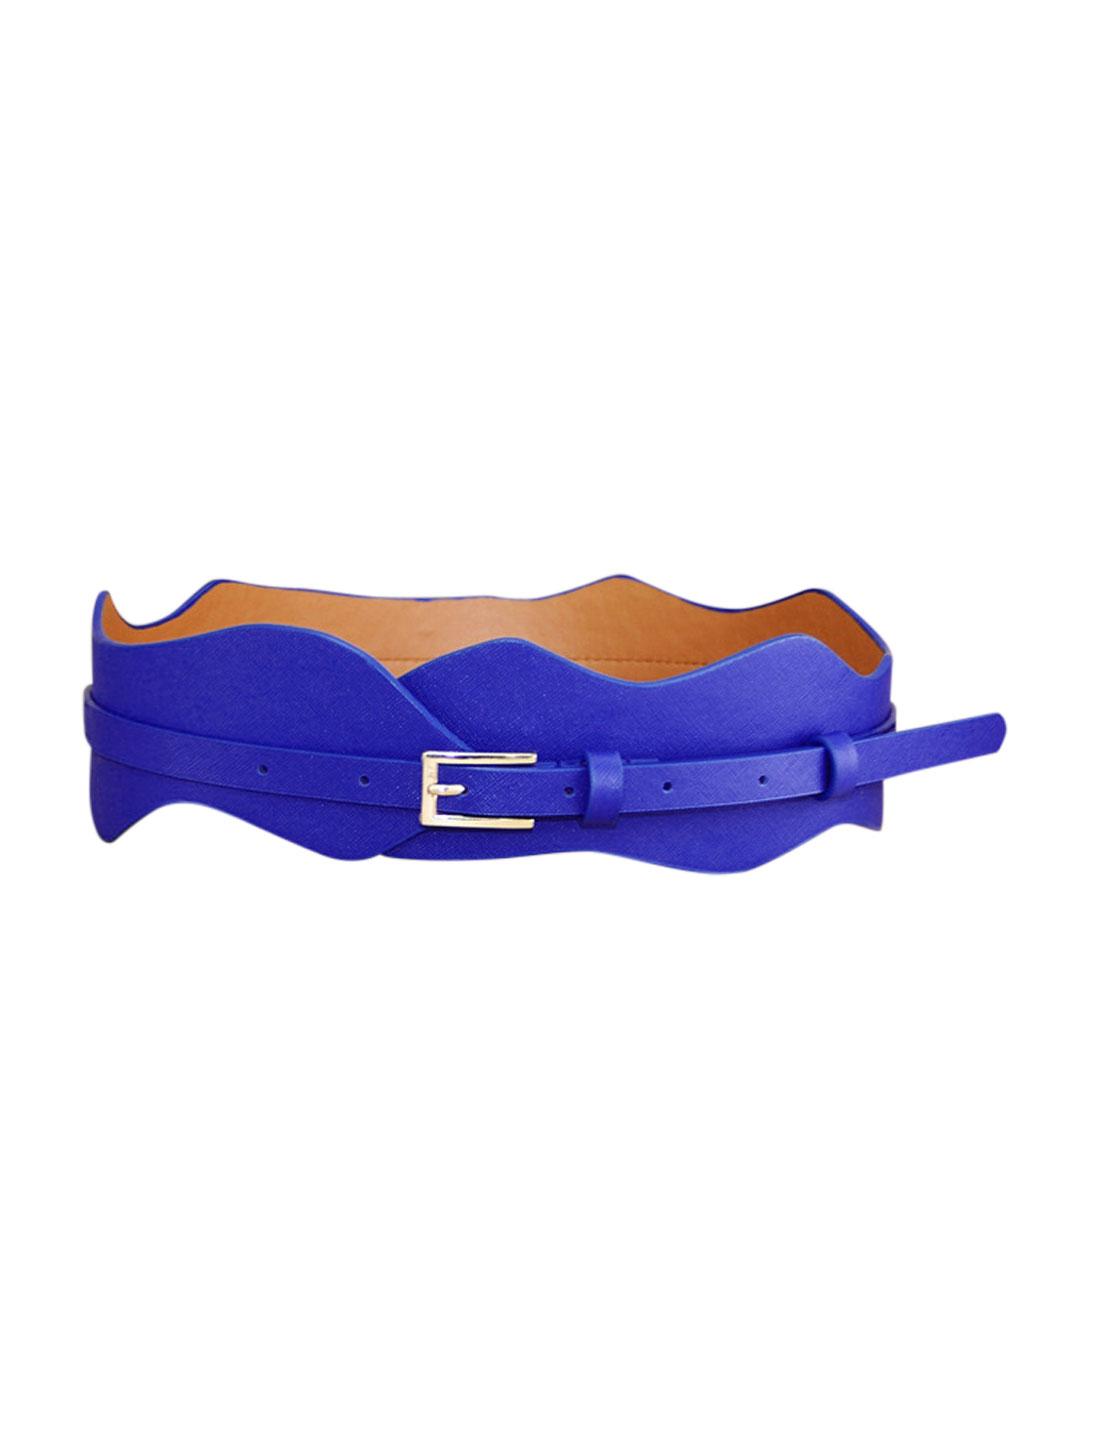 Women Wave Design Adjustable Single Pin Buckle Belt Blue